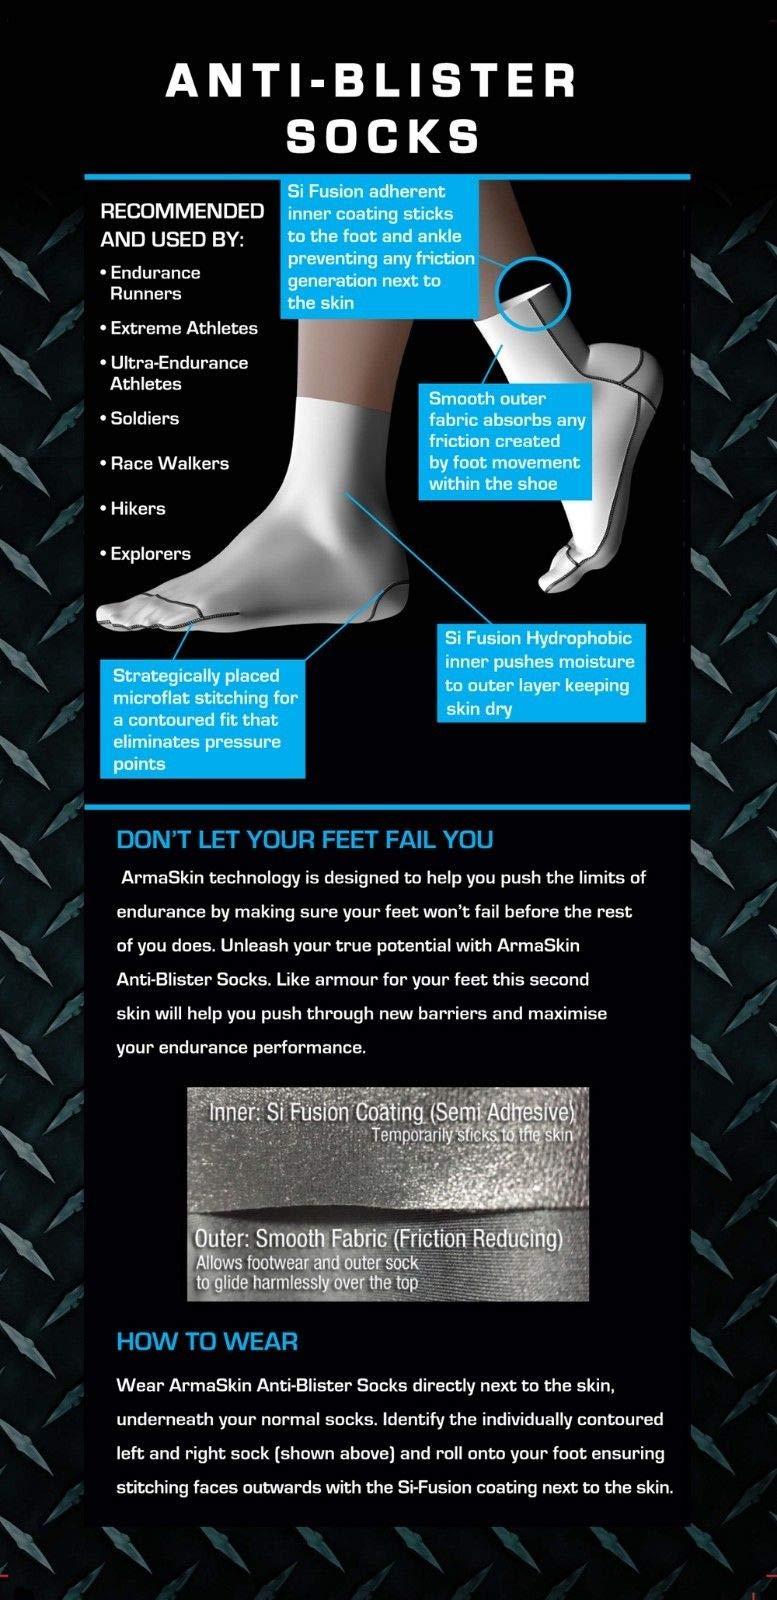 ArmaSkin Extreme Anti-Blister Hiking Crew Socks for Men and Women (Black, X-Large) by ArmaSkin